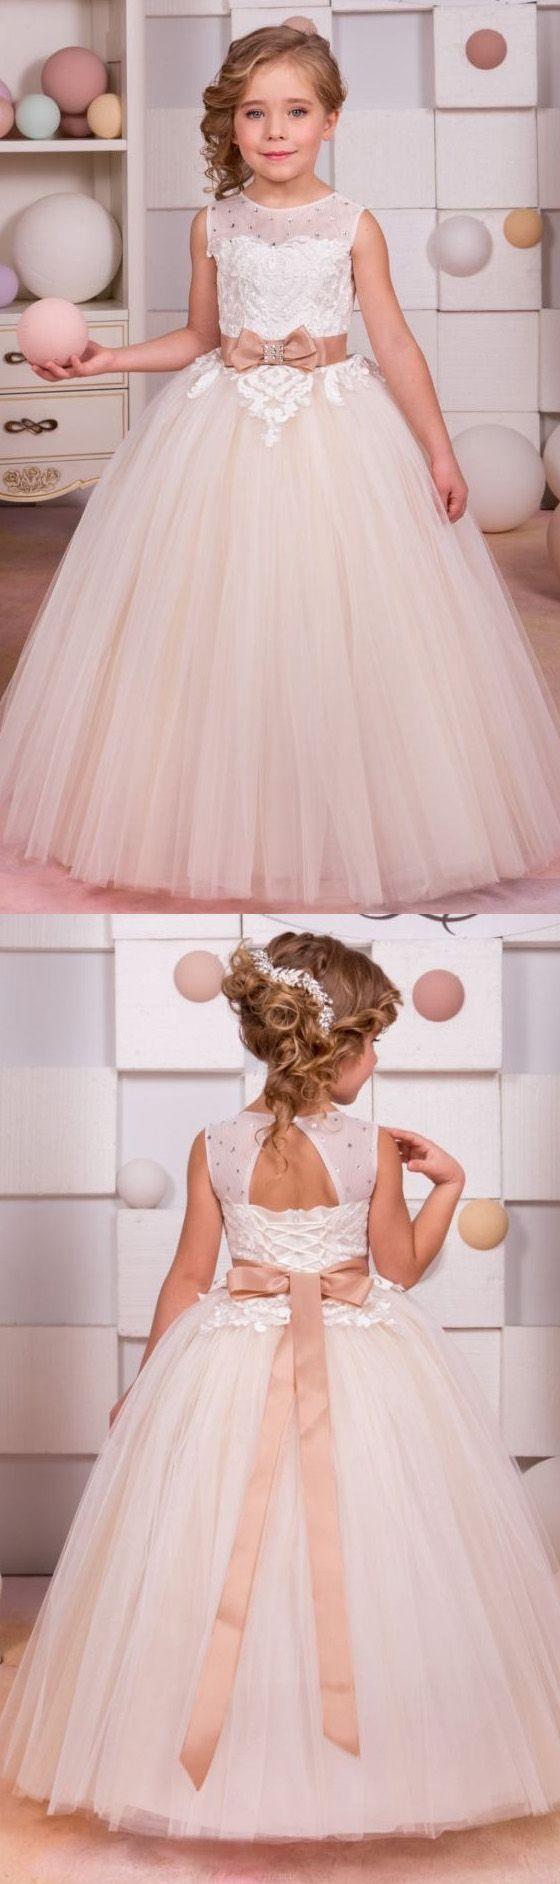 Alineprincess flower girl dresses long white dresses with open